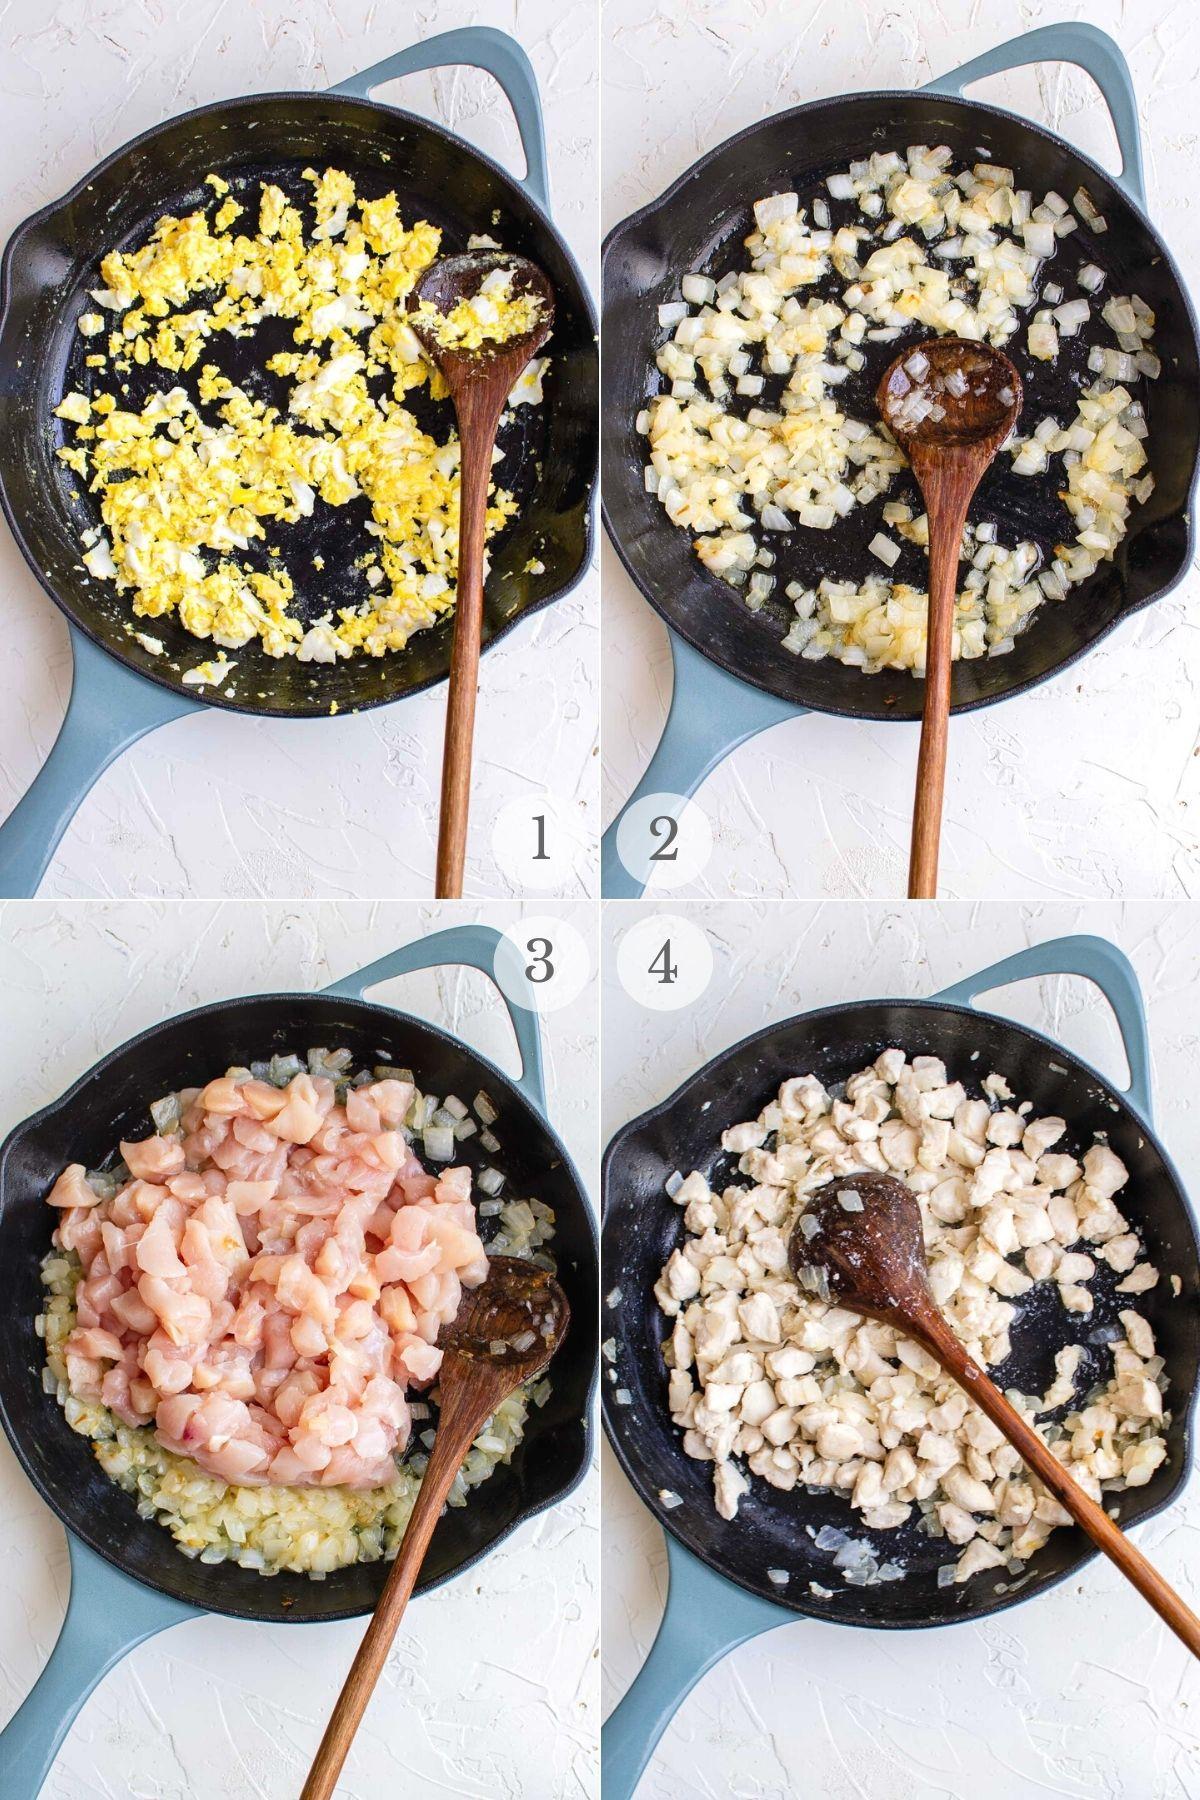 chicken pad thai recipes steps 1-4